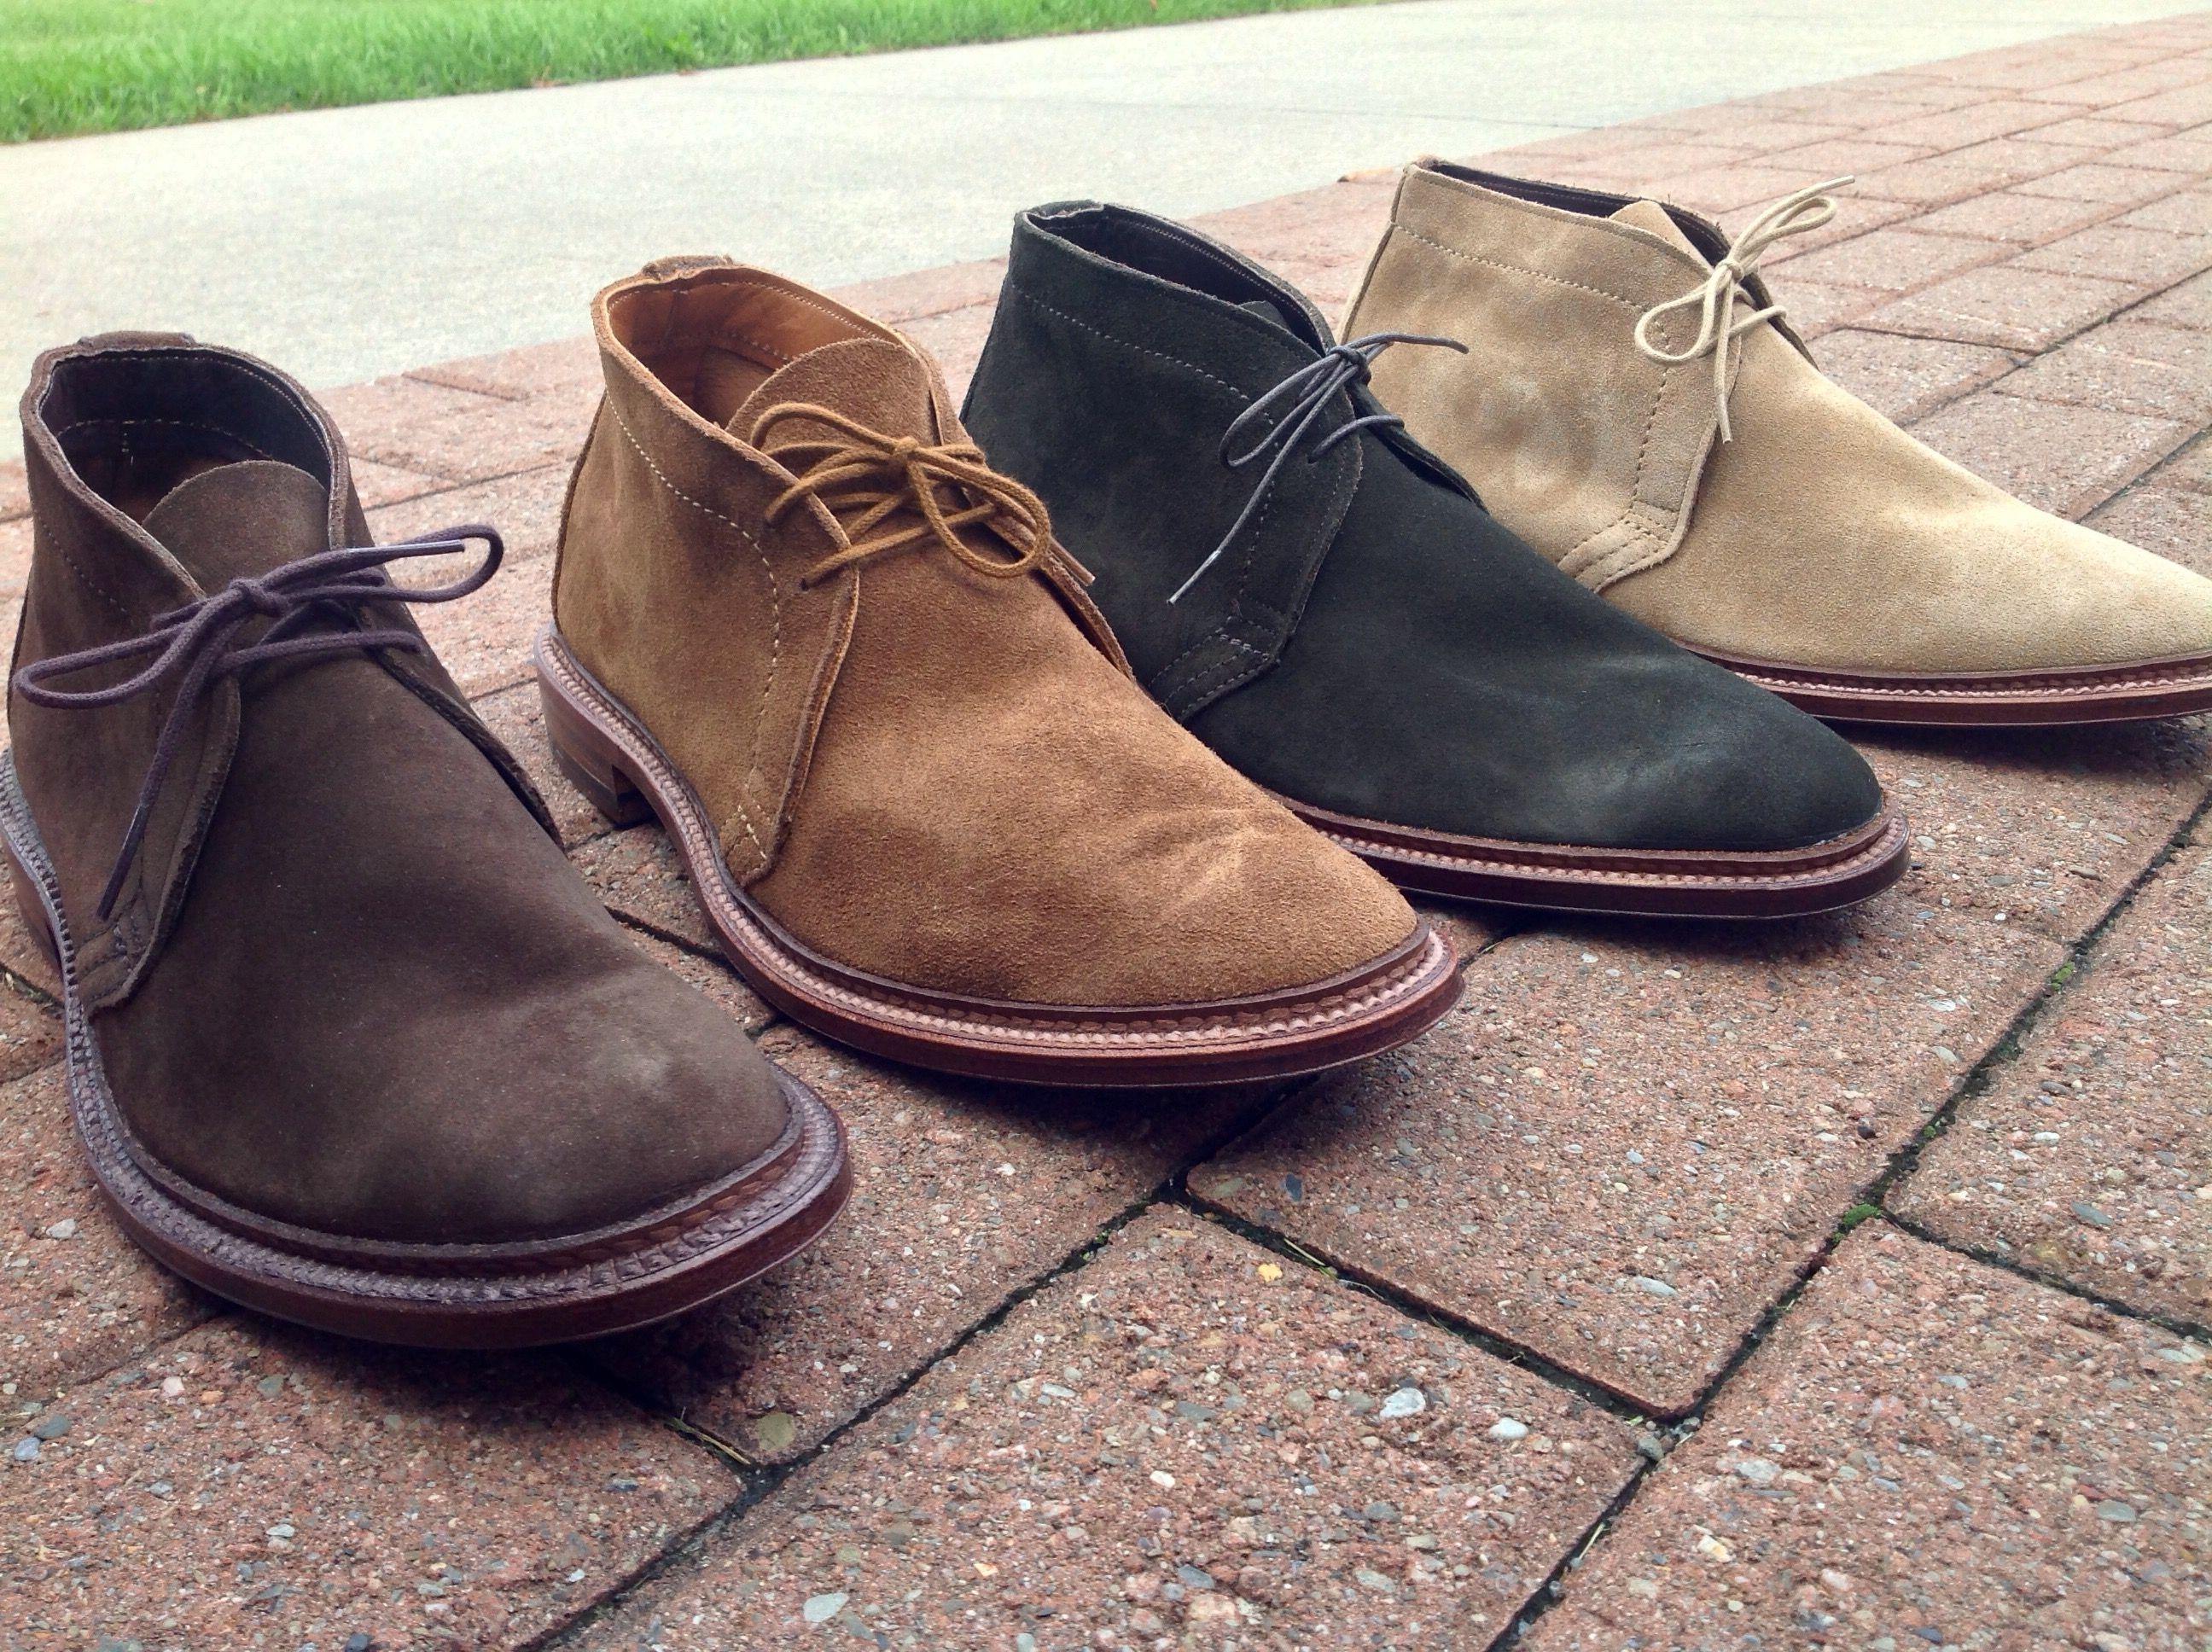 c740acde528 Alden Men's Unlined Chukka Boots. Suede Leather. Leydon Last. Flex ...